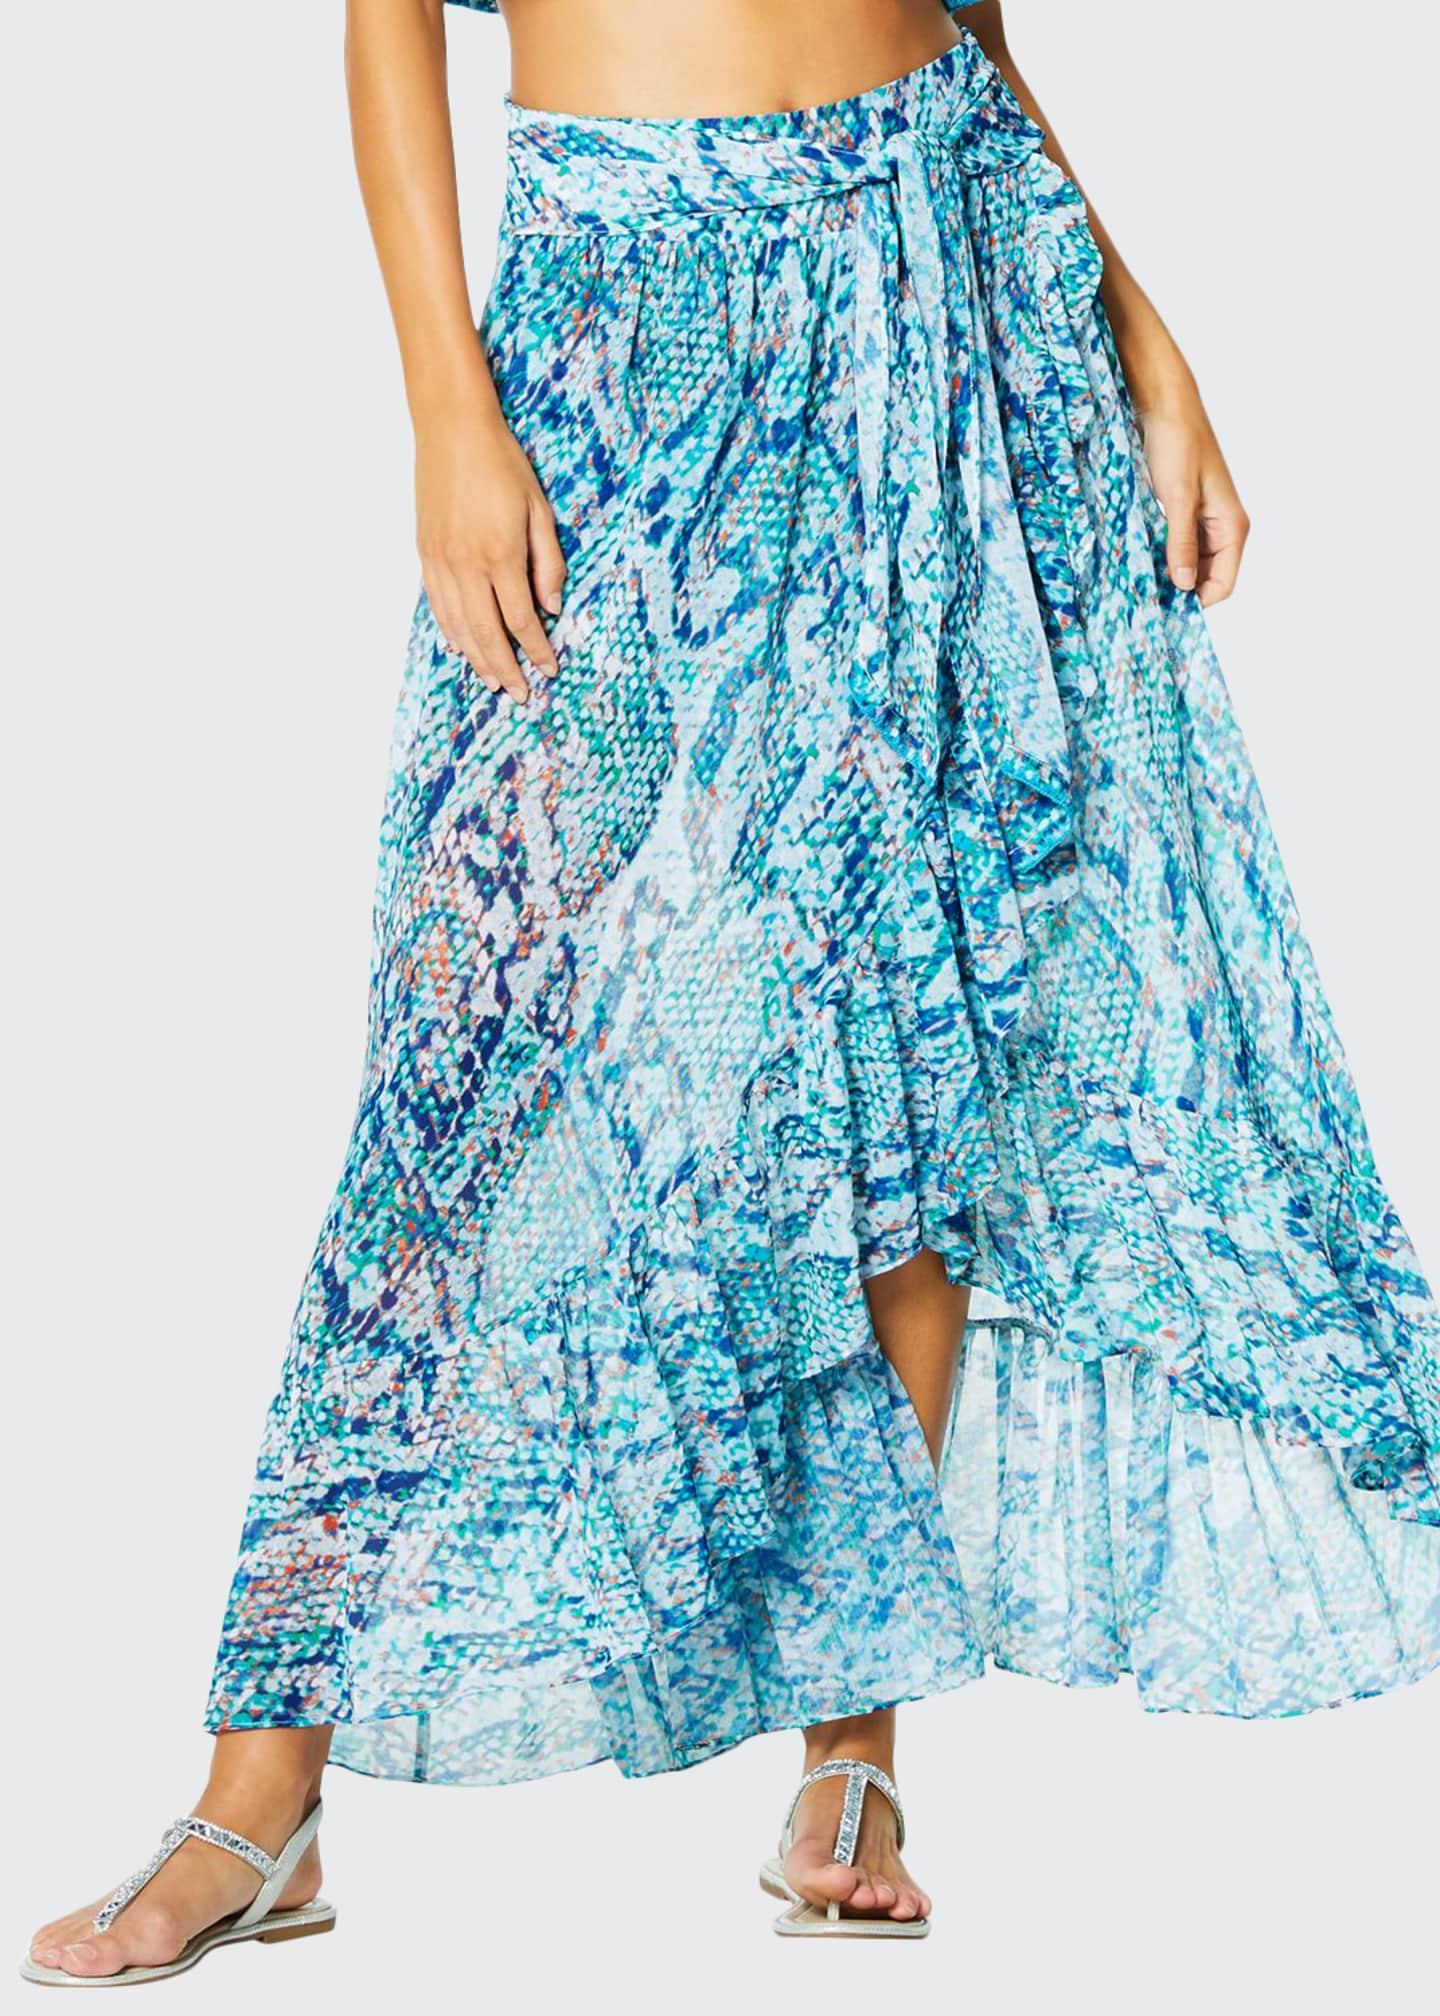 Ramy Brook Verona Printed Coverup Skirt